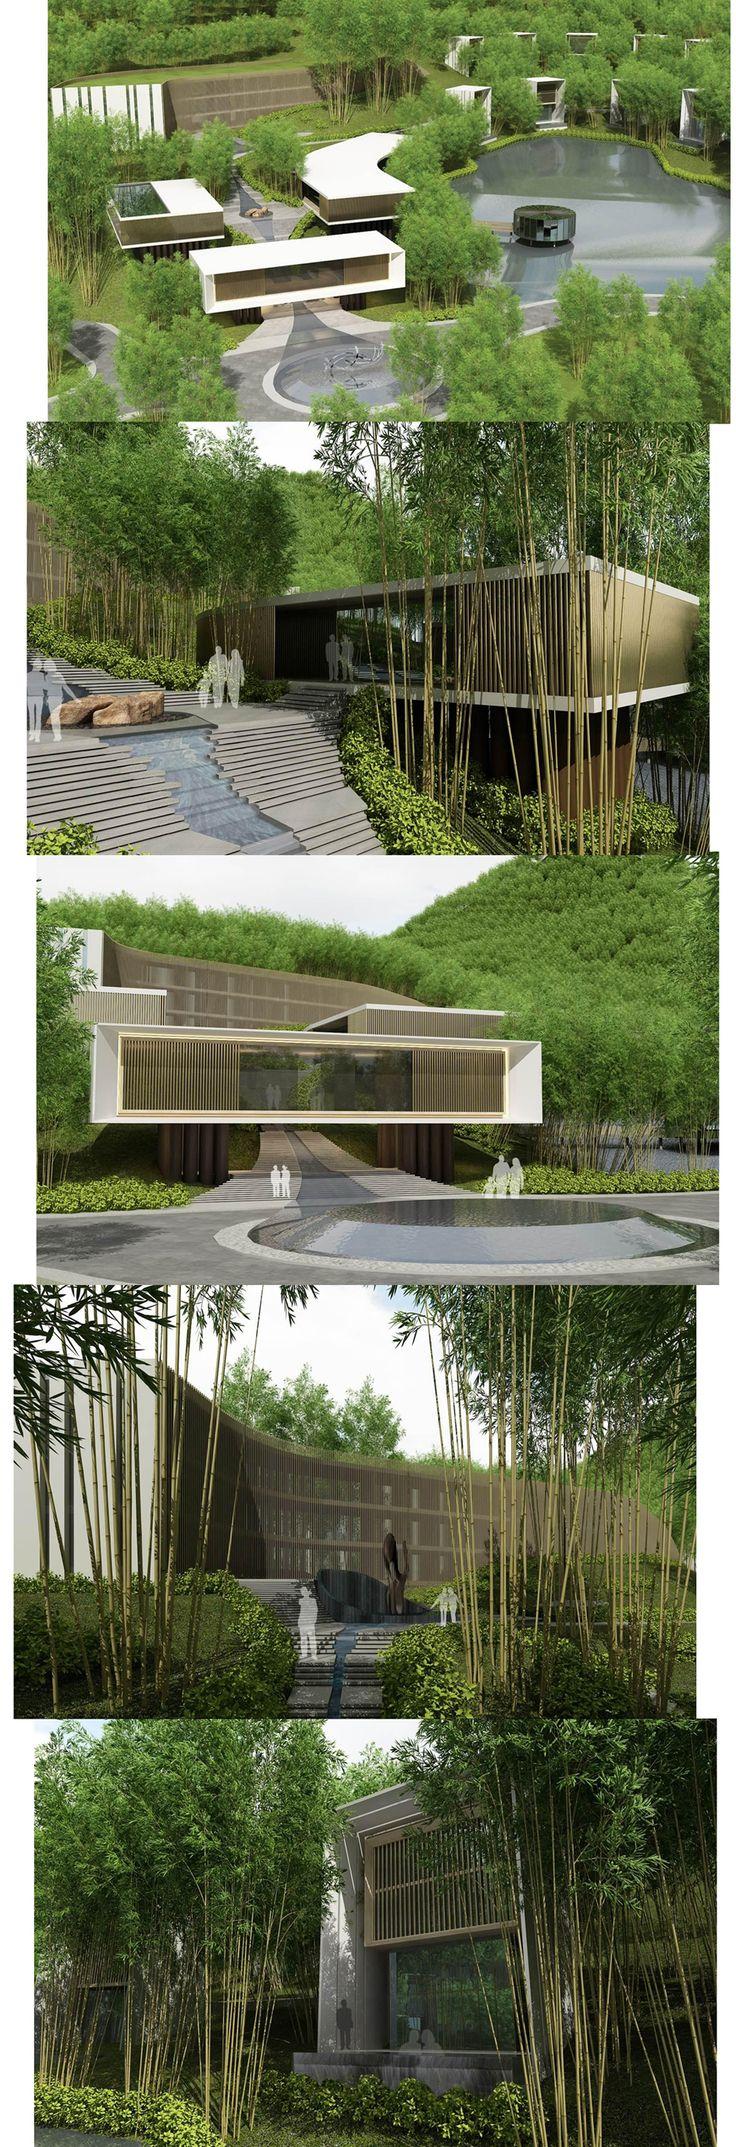 Architecture_Bamboo Resort Hotel_ Minkke architects